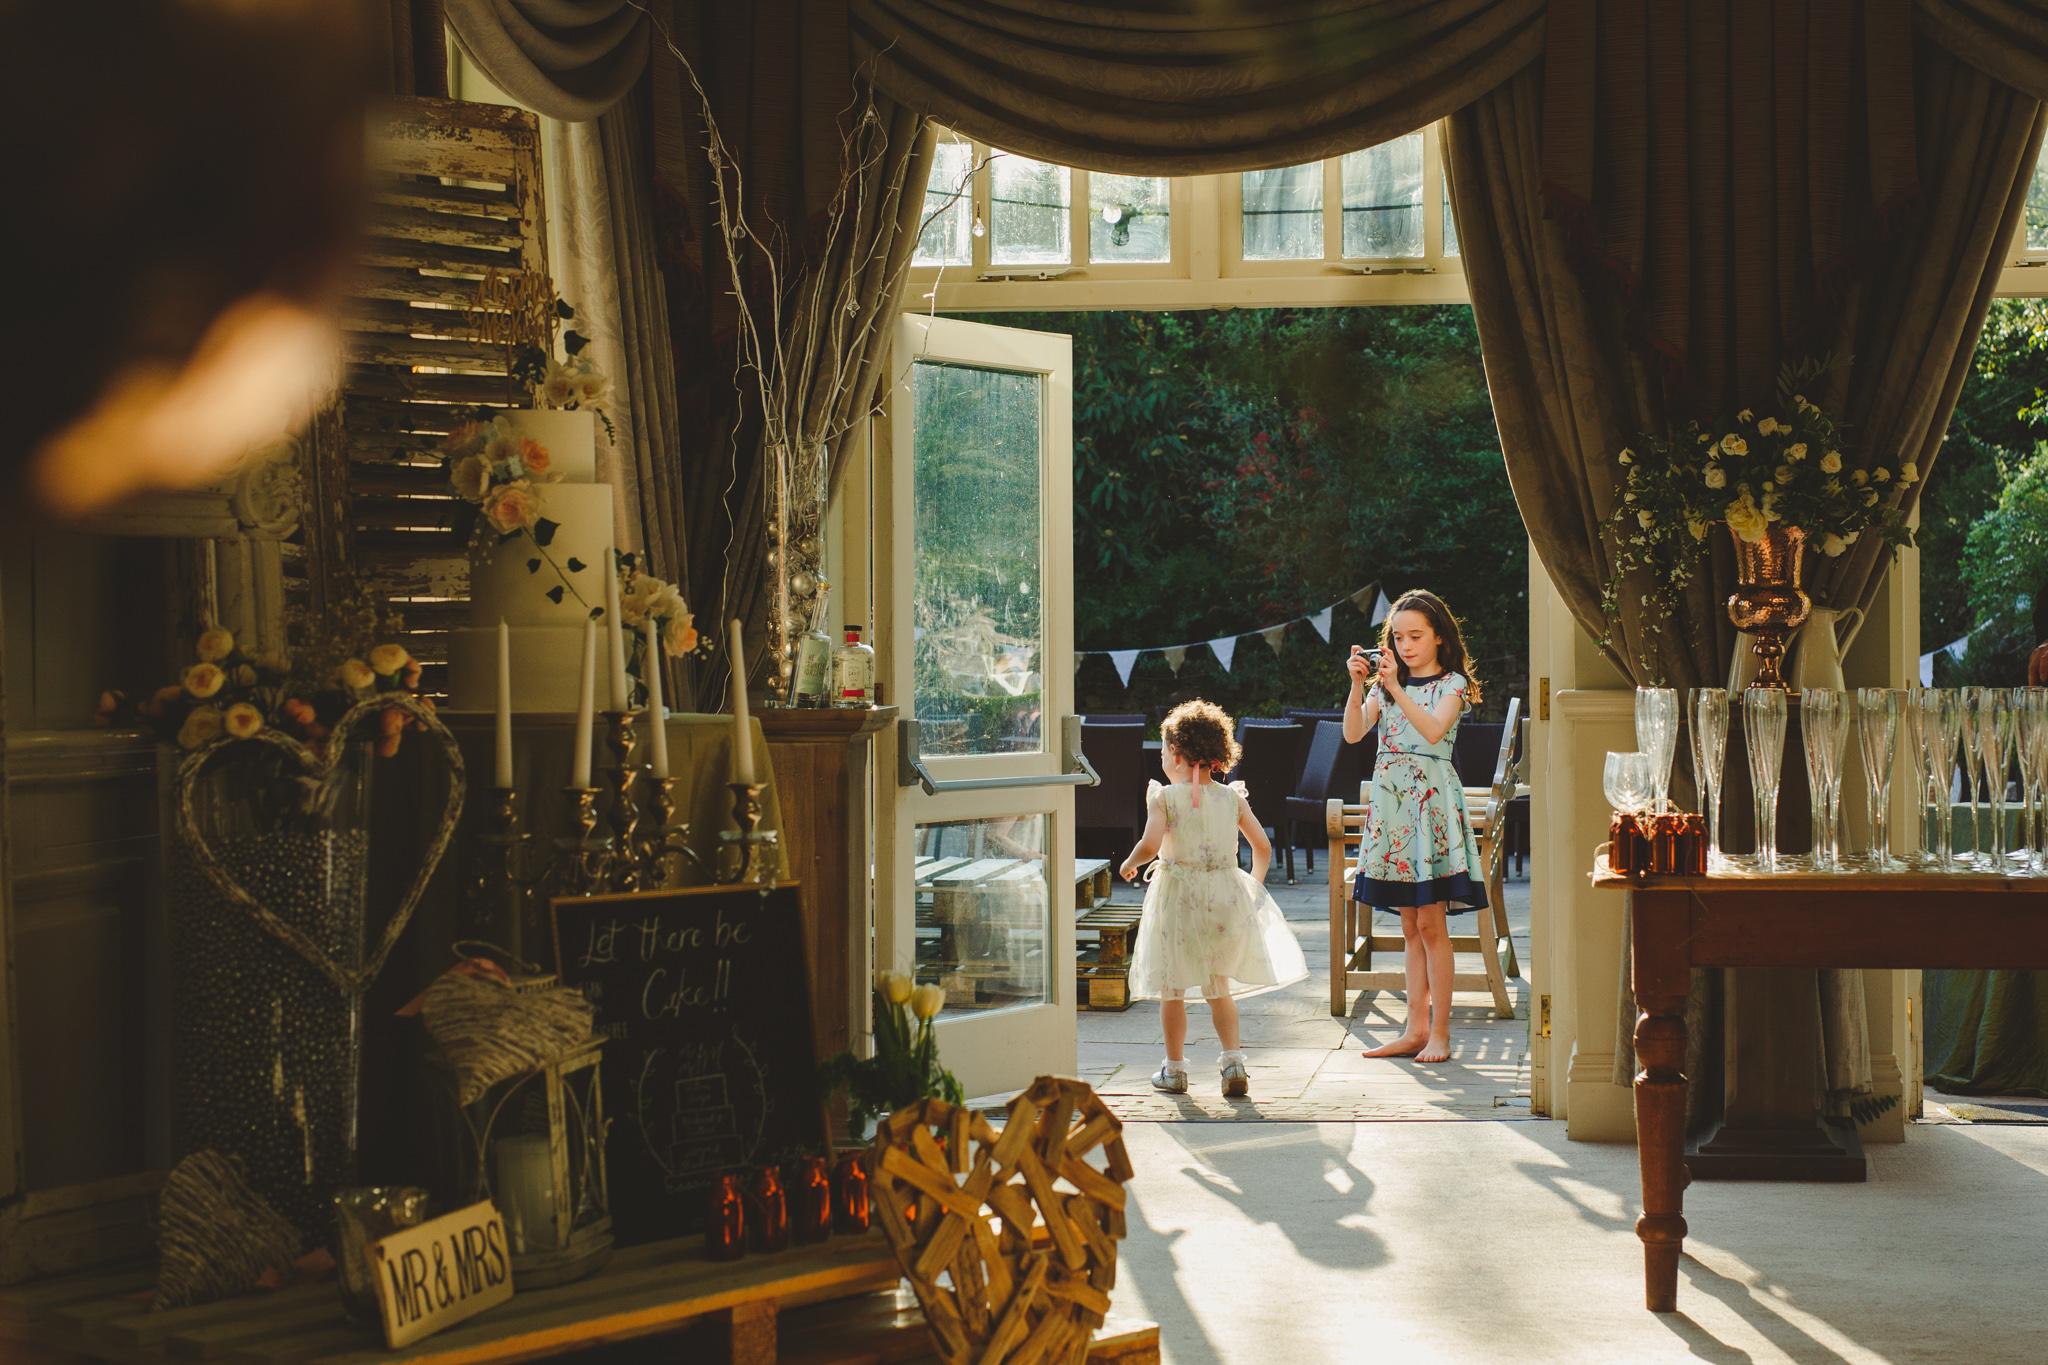 derbyshire-wedding-photographer-videographer-camera-hannah-24.jpg